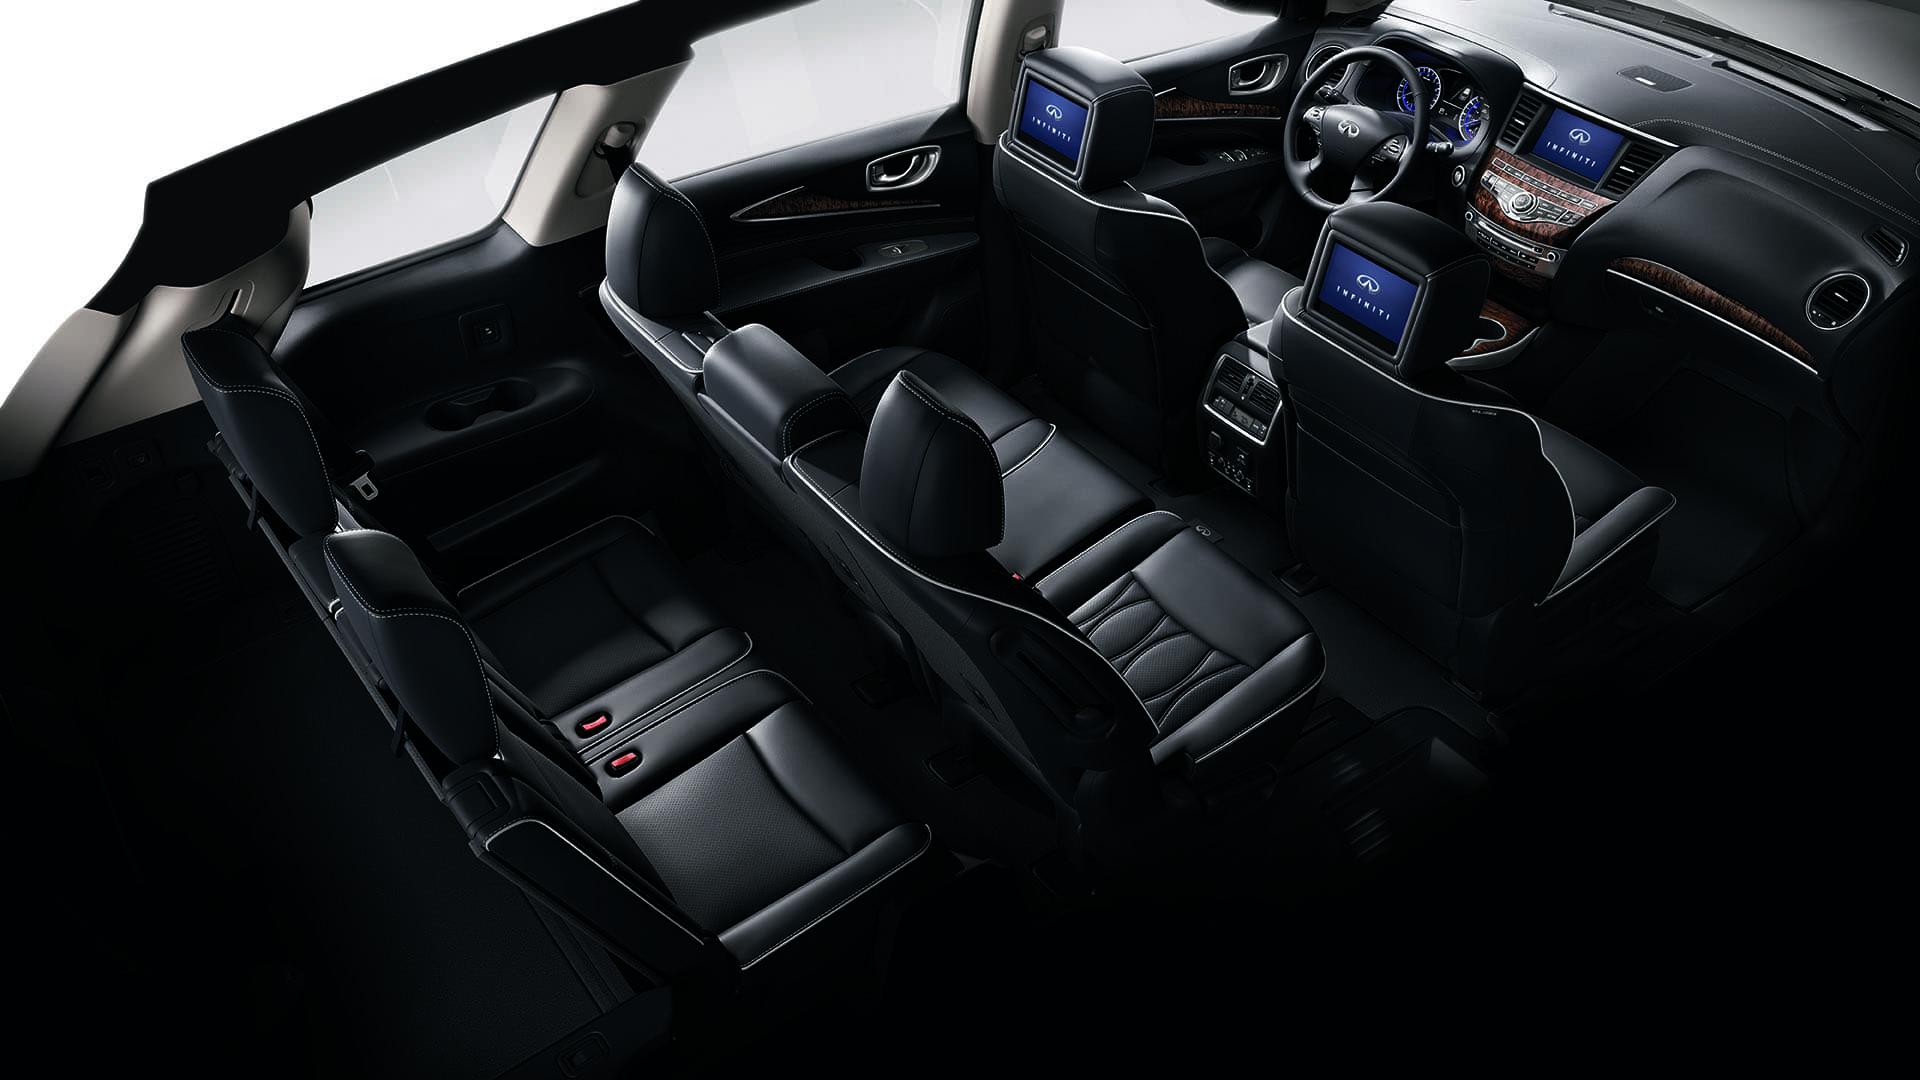 2020 INFINITI Qx60 Suv 3rd Row Seating View